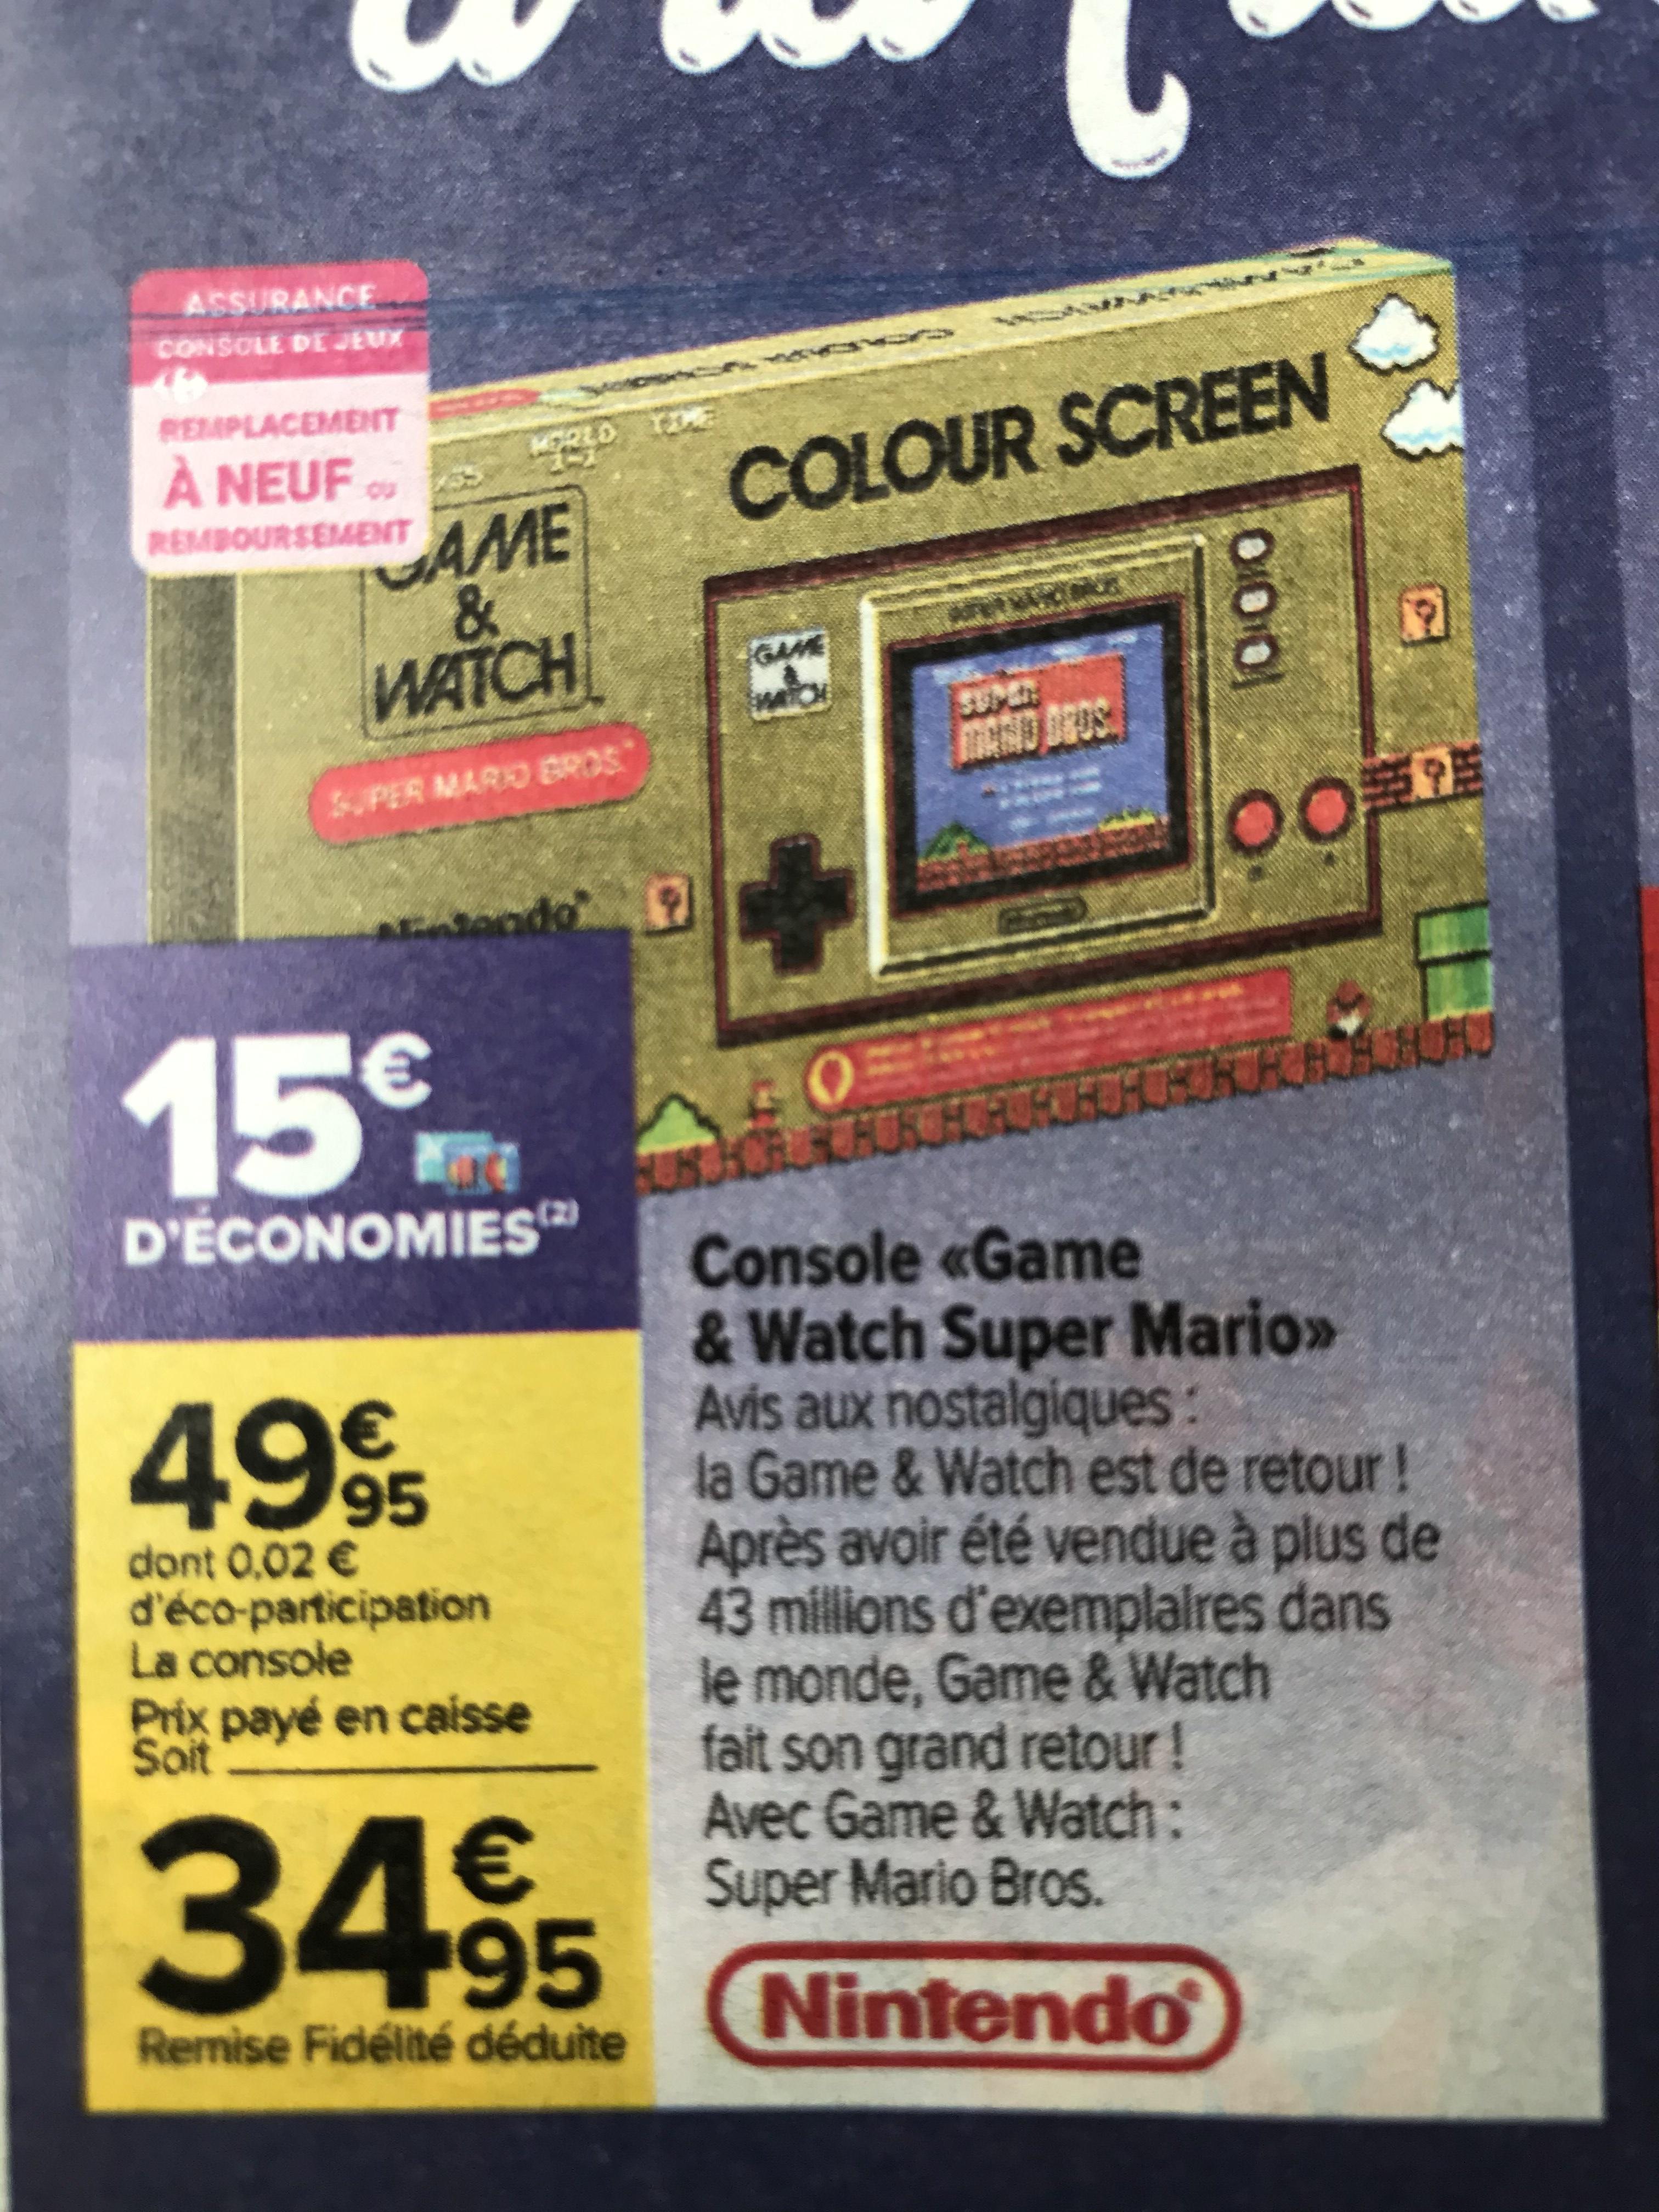 Console portable Nintendo Game & Watch Super Mario Bros. (via 15€ sur la carte de fidélité)